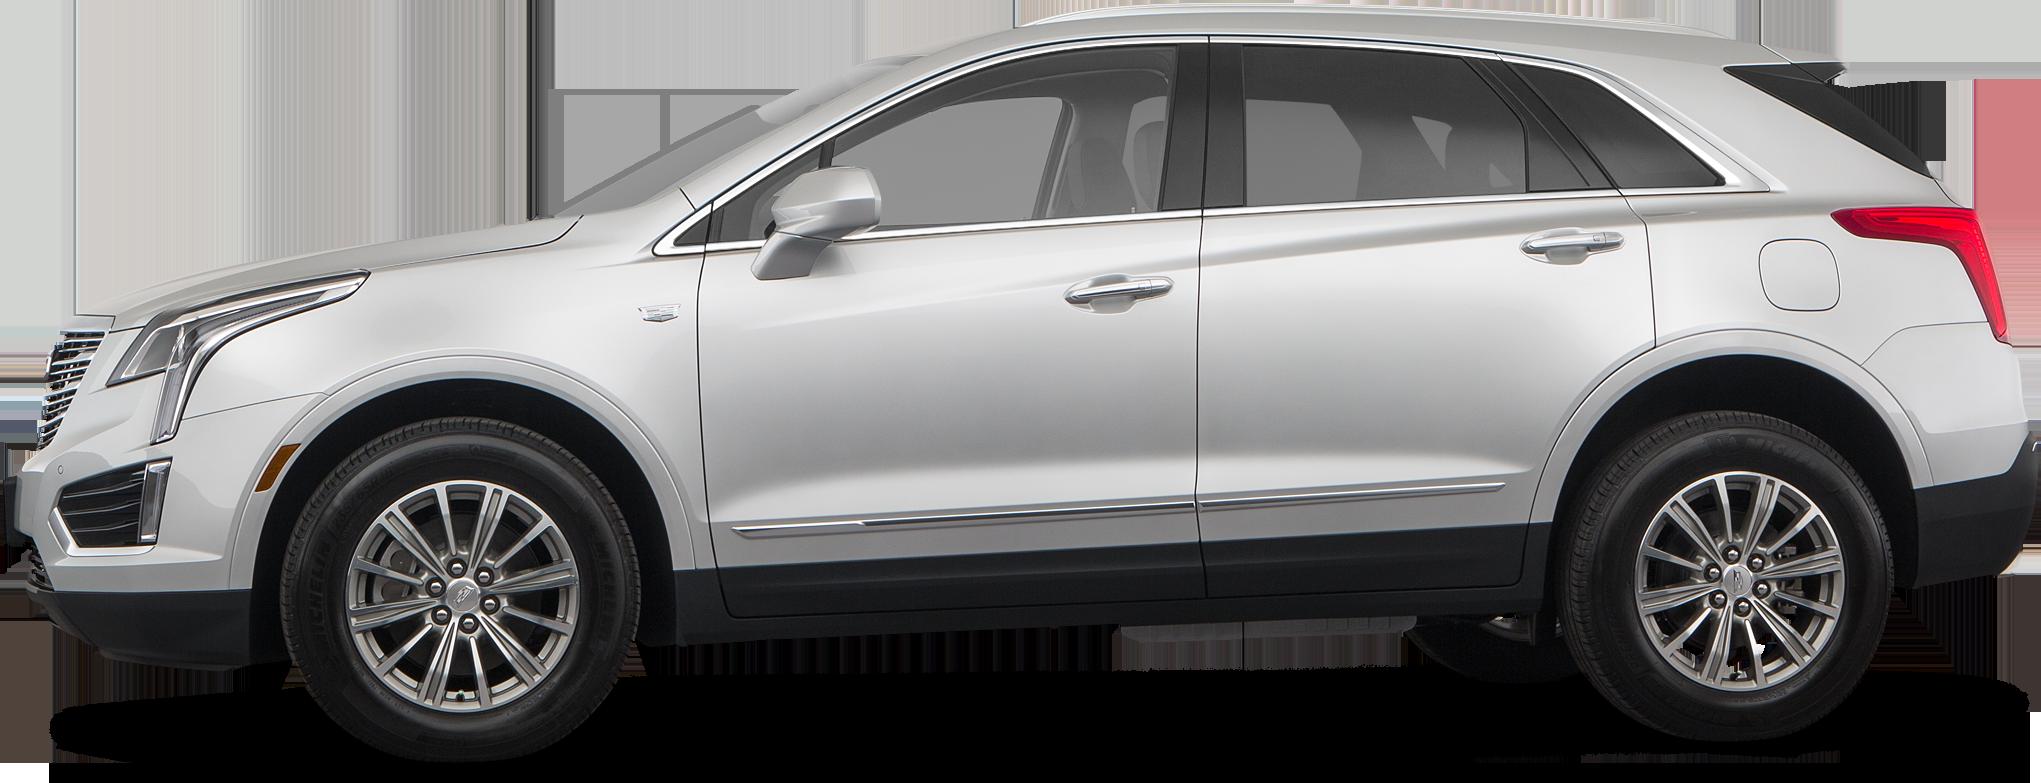 2019 CADILLAC XT5 SUV Luxury